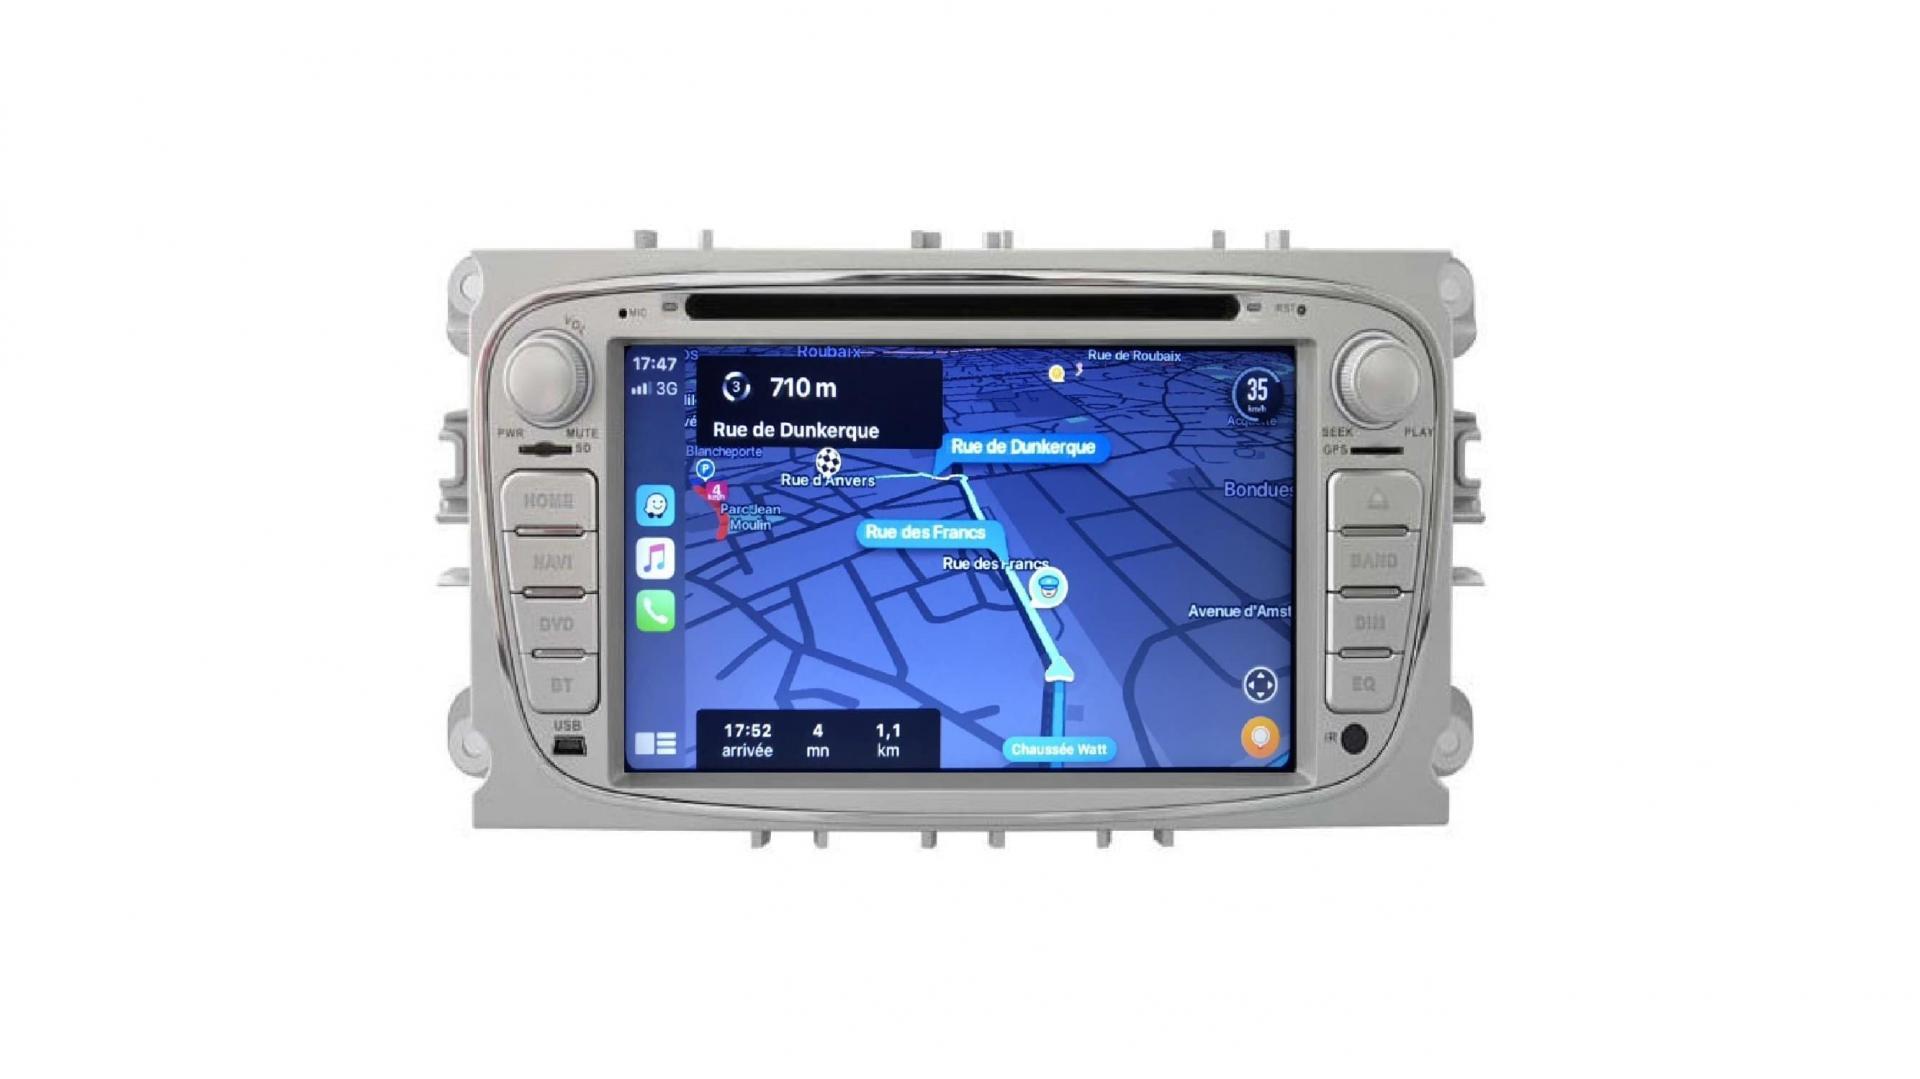 Autoradio s max galaxy mondeo focus autoradio gps bluetooth android auto carplay camera de recul commande au volant4